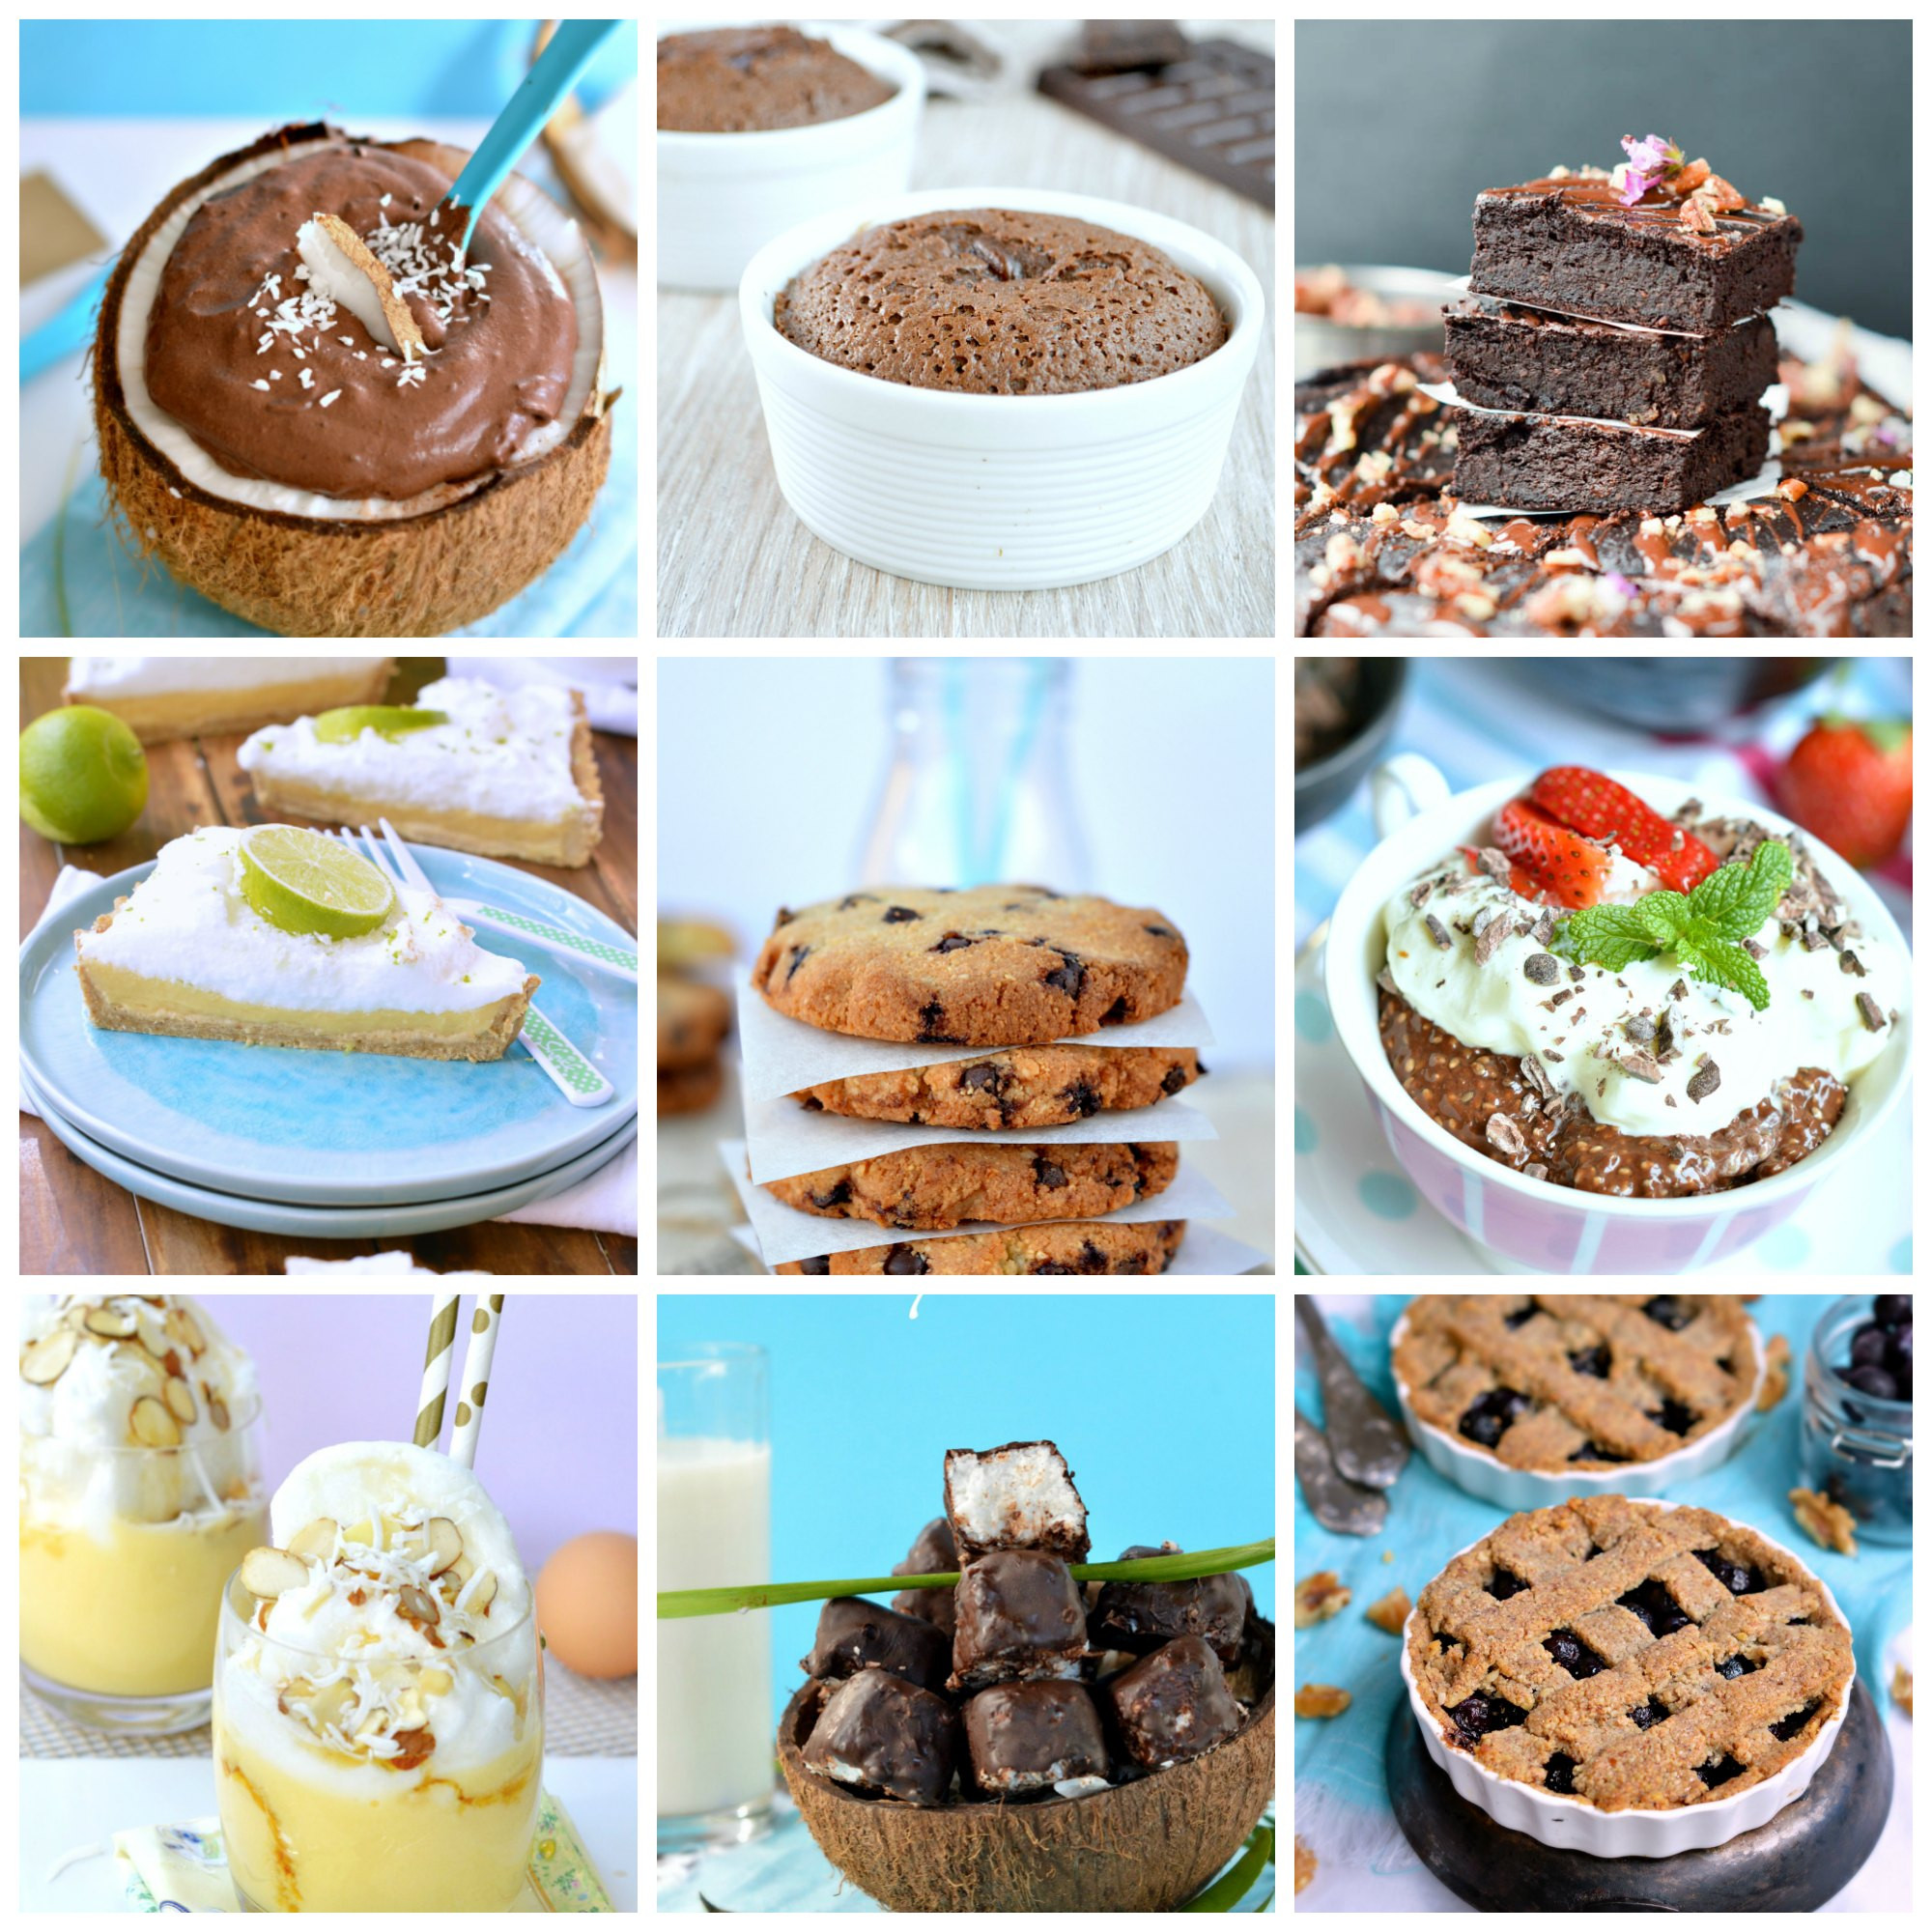 Low Sugar Desserts For Diabetics  10 Sugar Free Desserts for diabetics Sweetashoney